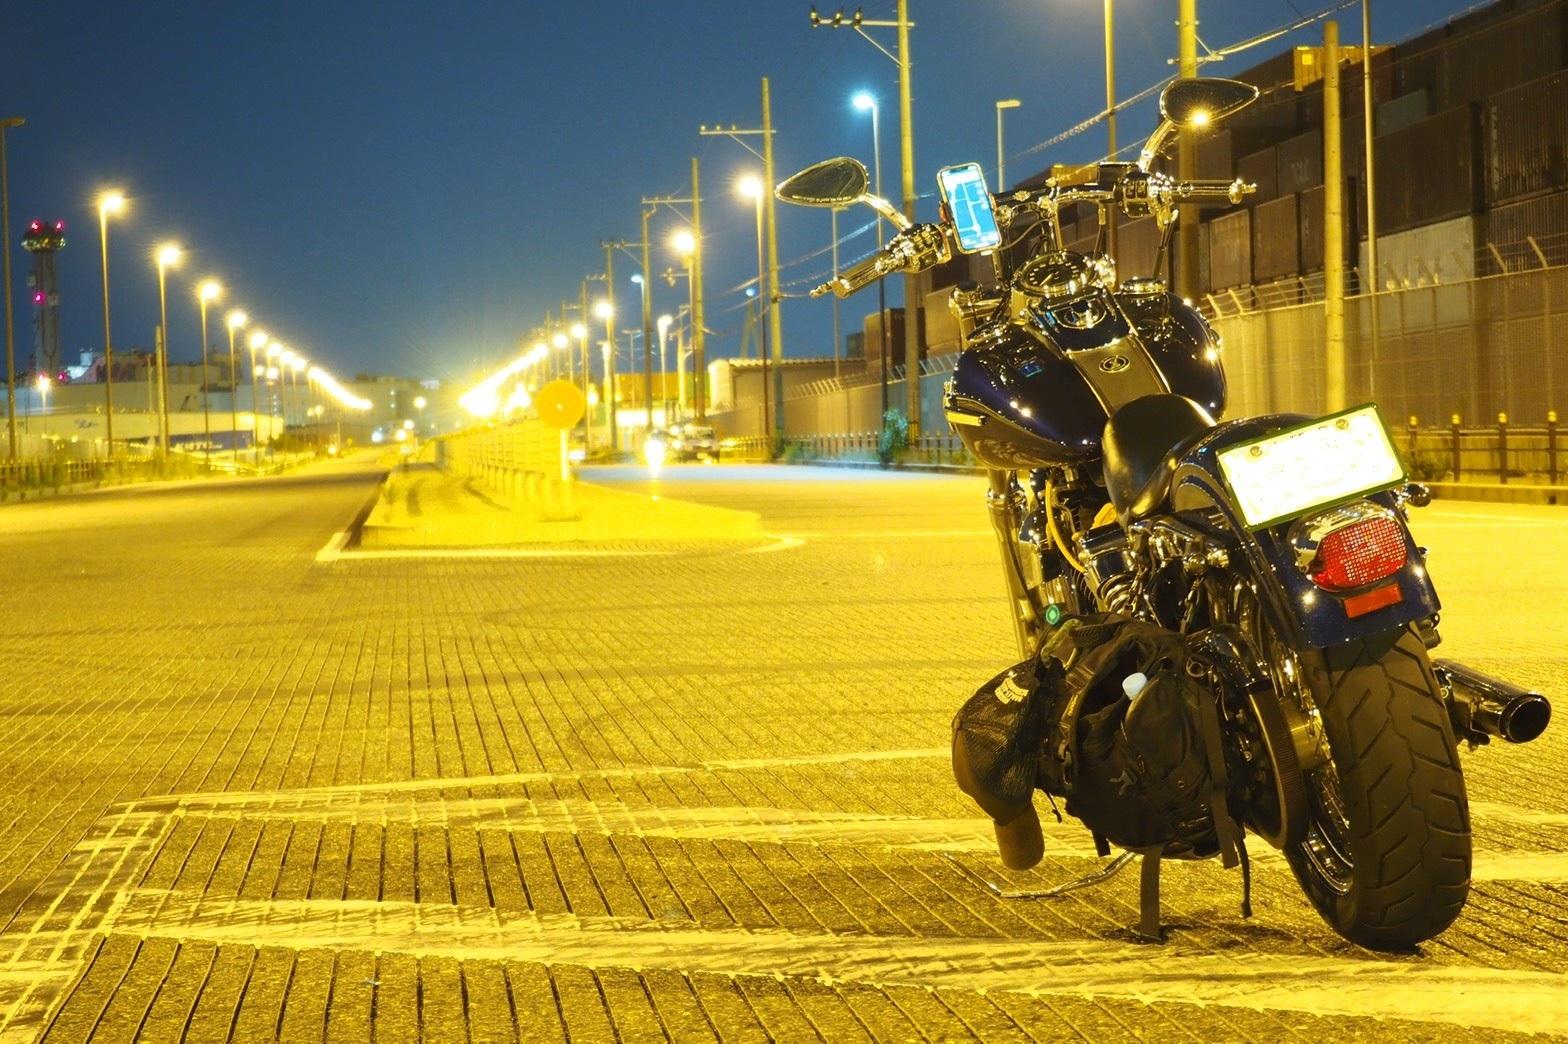 harleydavidson-motorcycle-touring-blog-osaka-port-yumeshima-nightview-containeryard-2.jpg